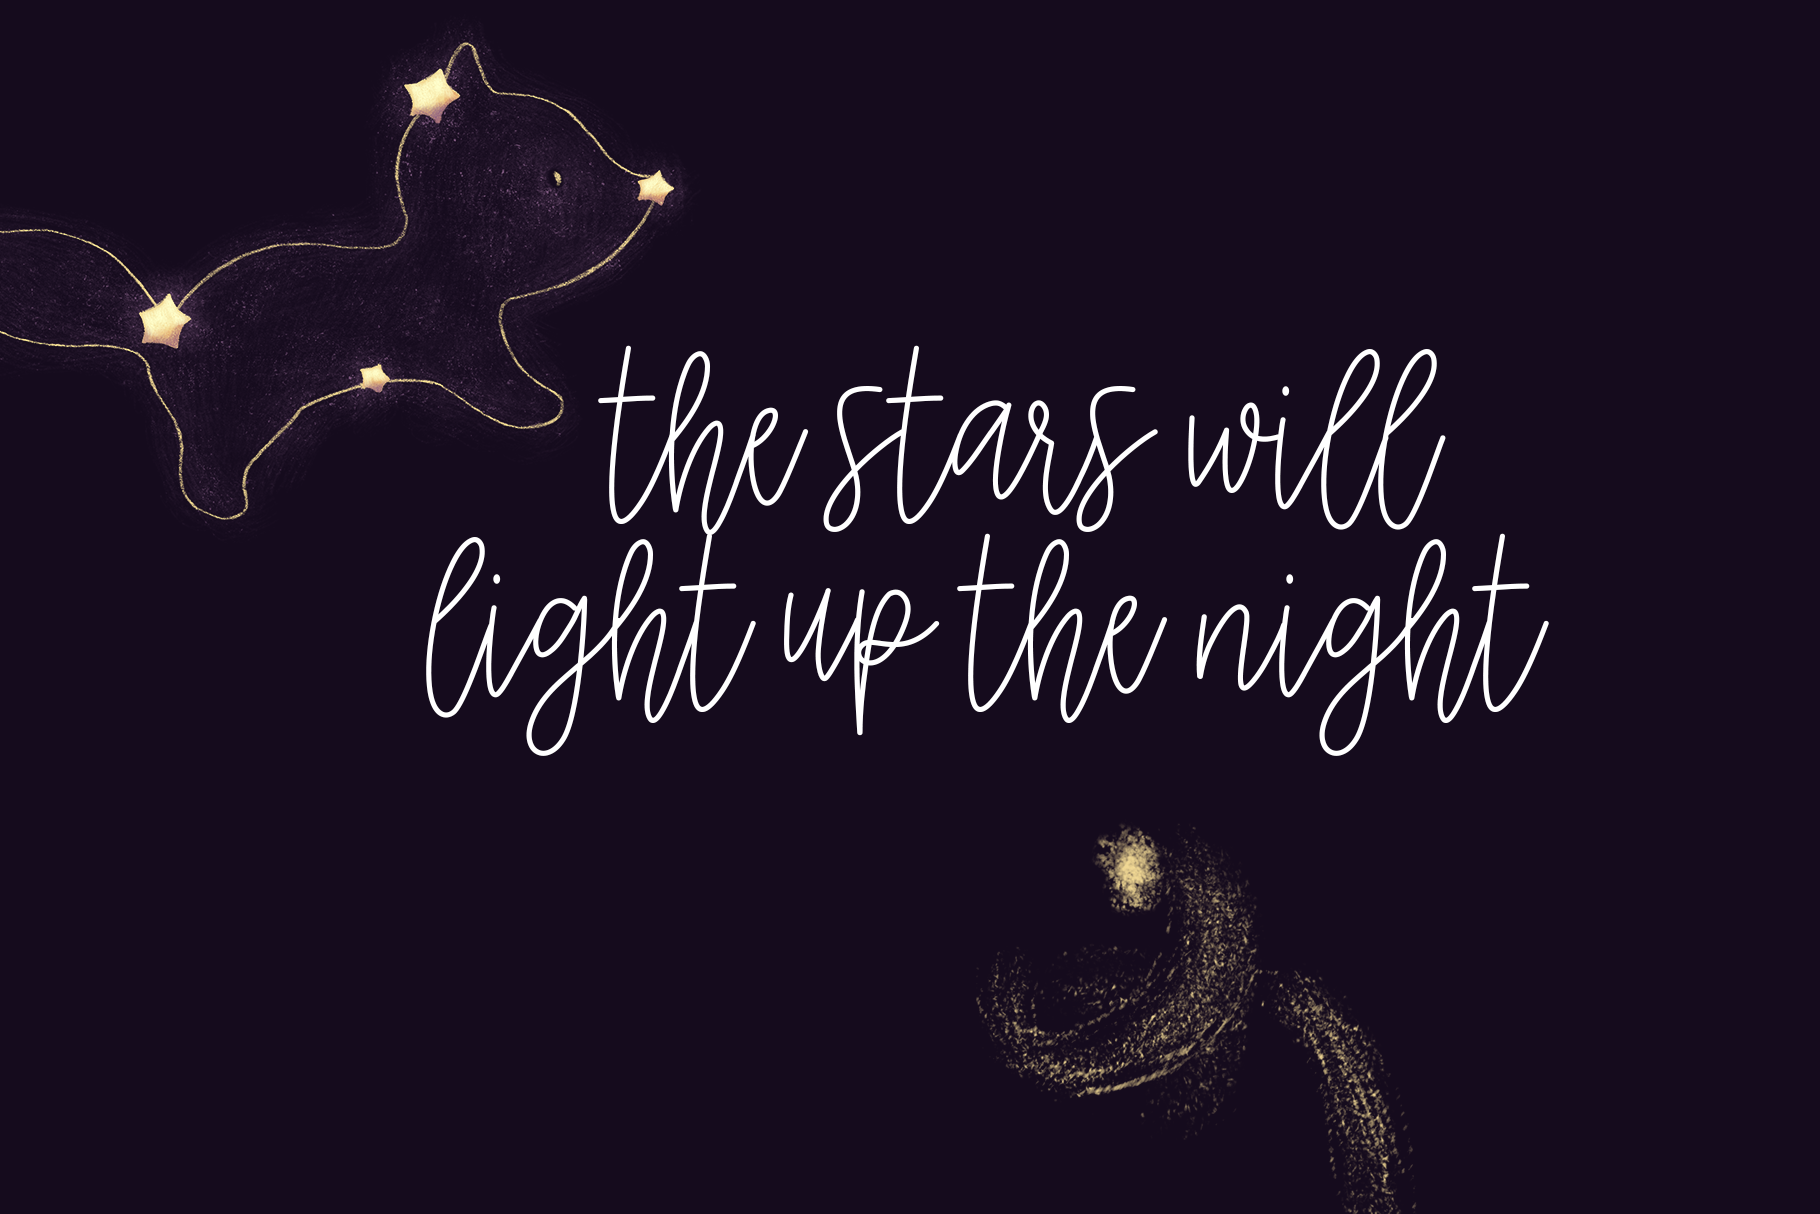 Fairytales - A Handwritten Script Font example image 2